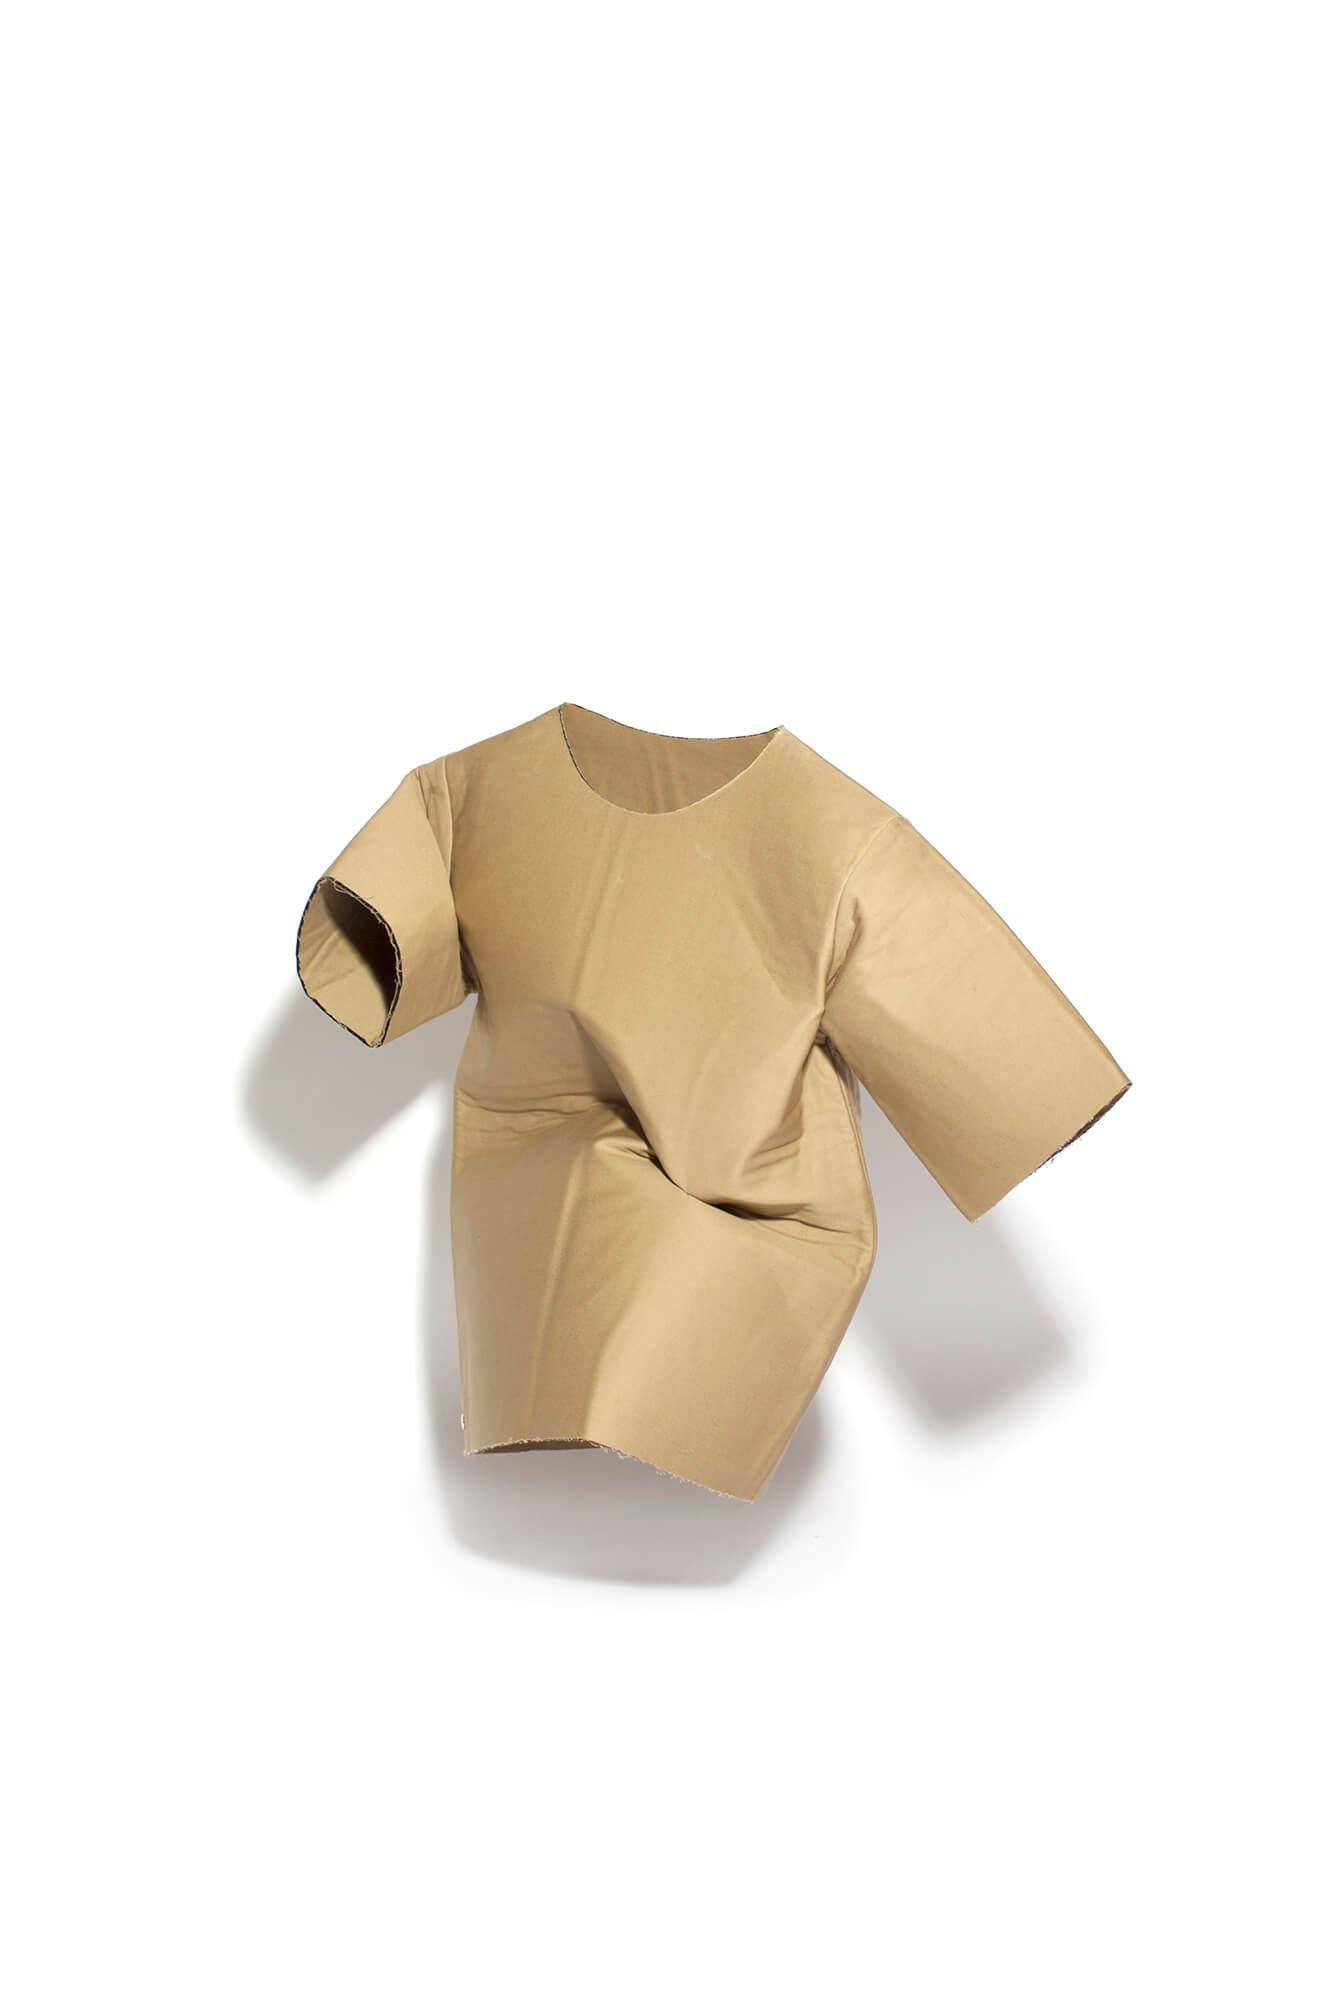 BLESS N°57 Cardboard T-Shirt